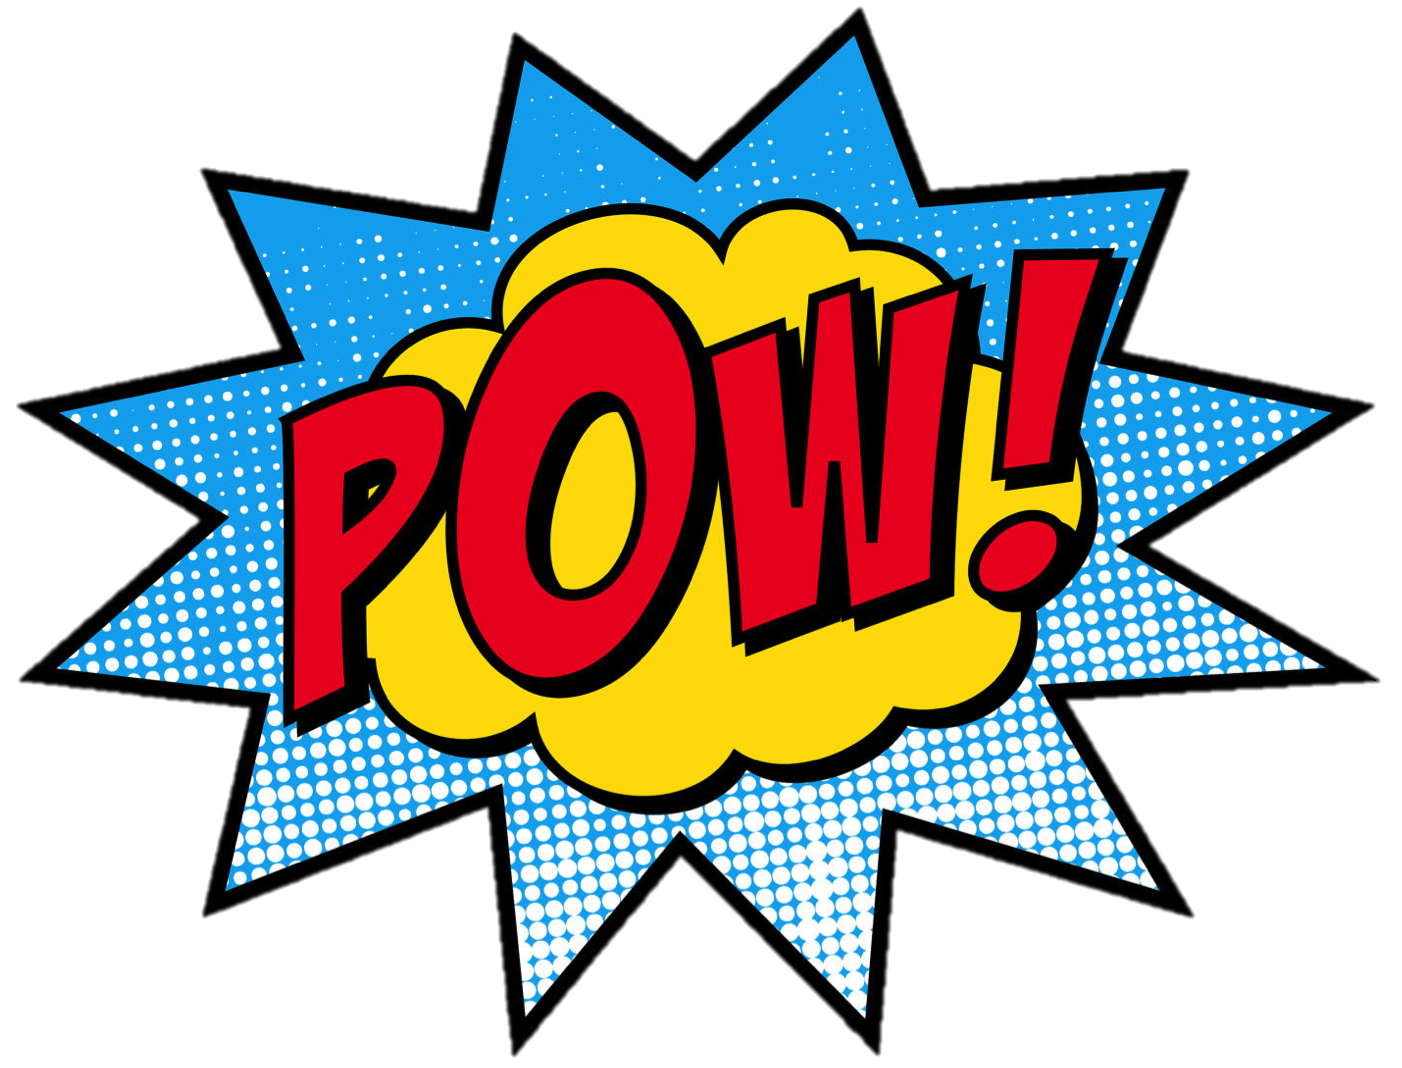 Free Superhero Transparent, Download Free Clip Art, Free.